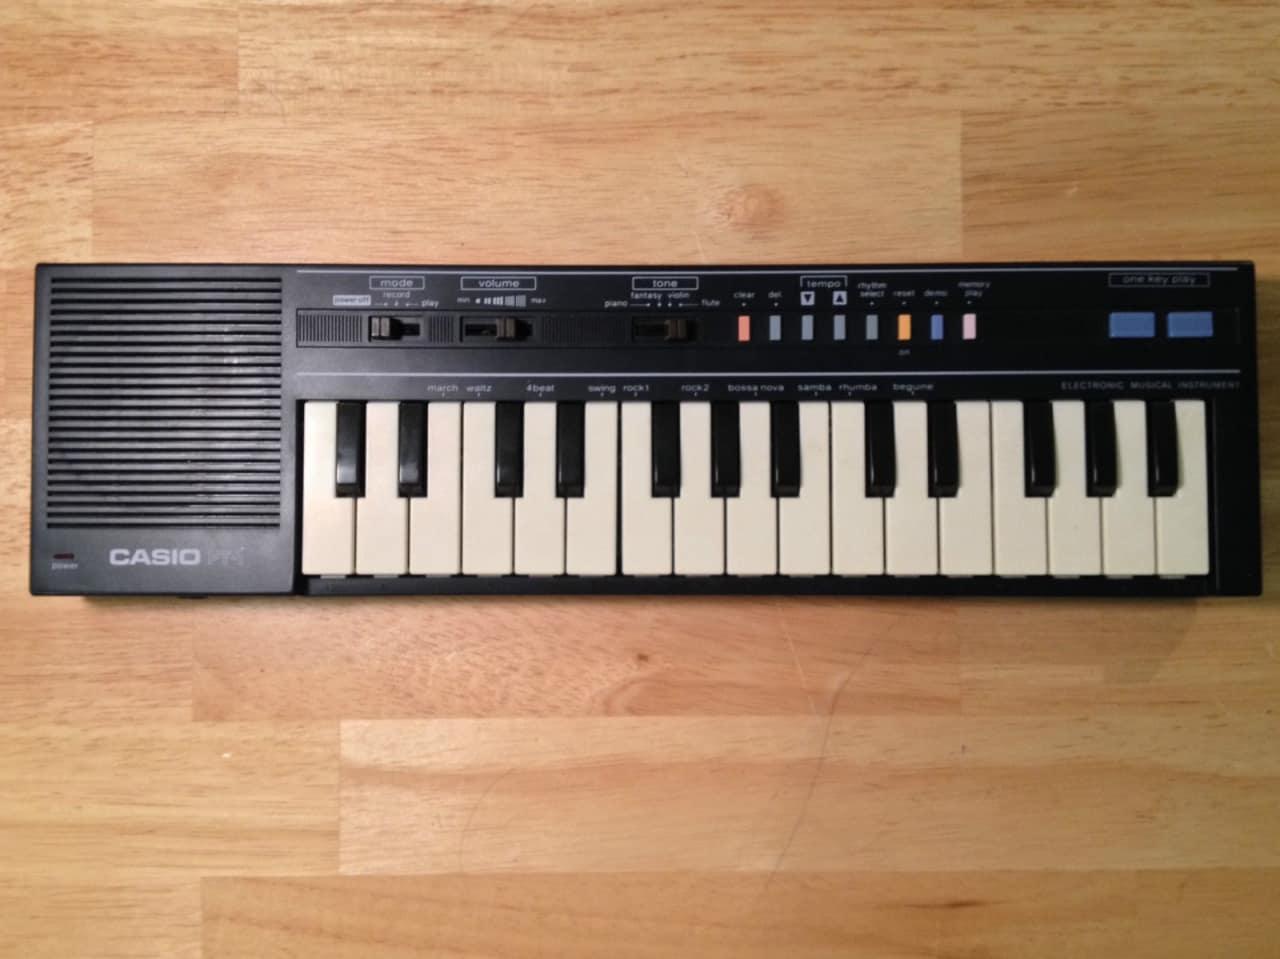 Casio Pt 1 1980 Black Orig Box Amp Manual Power Cord